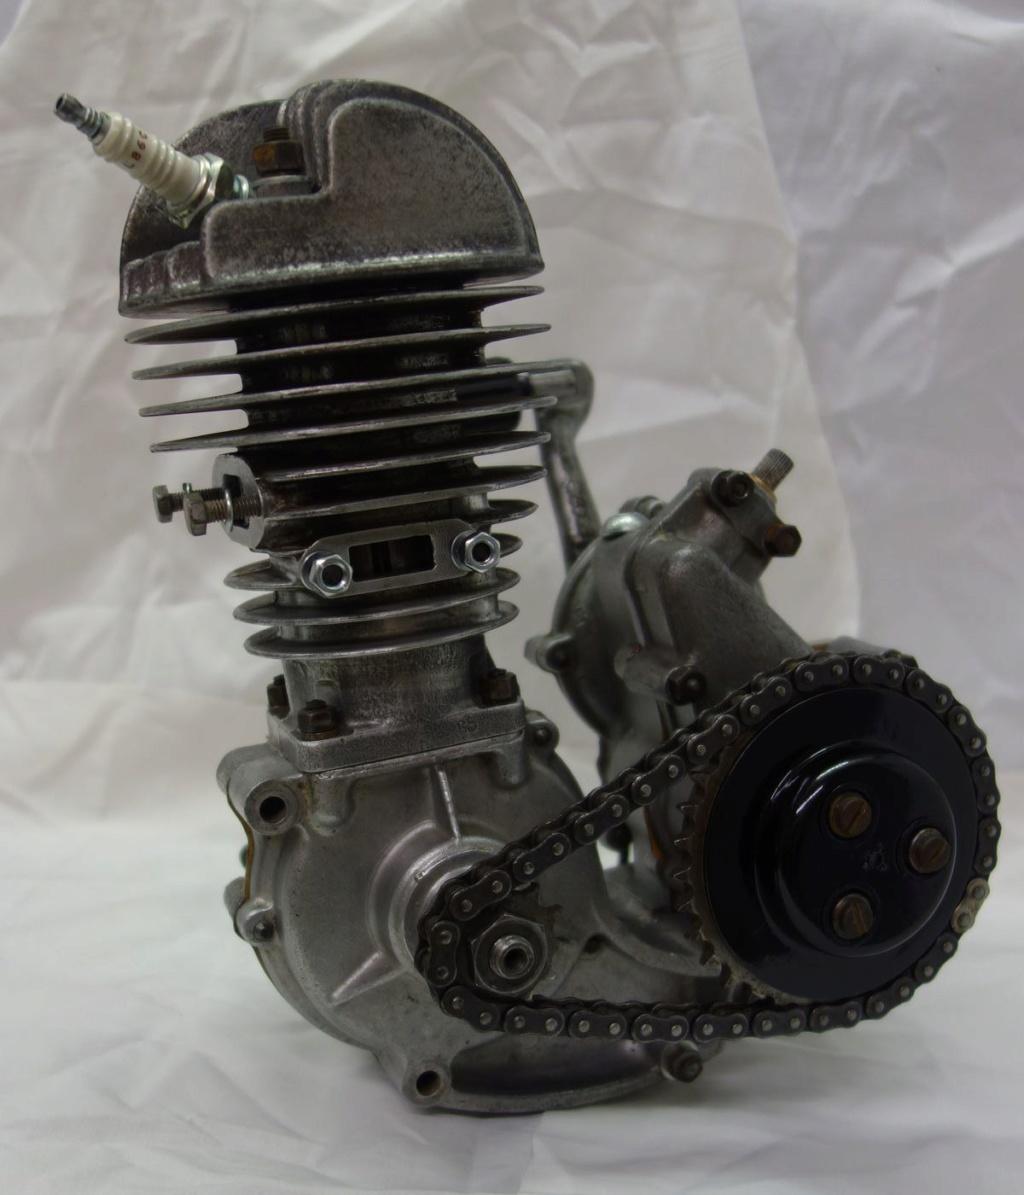 PEUGEOT P51 CLK2 1938 restauration _copie53